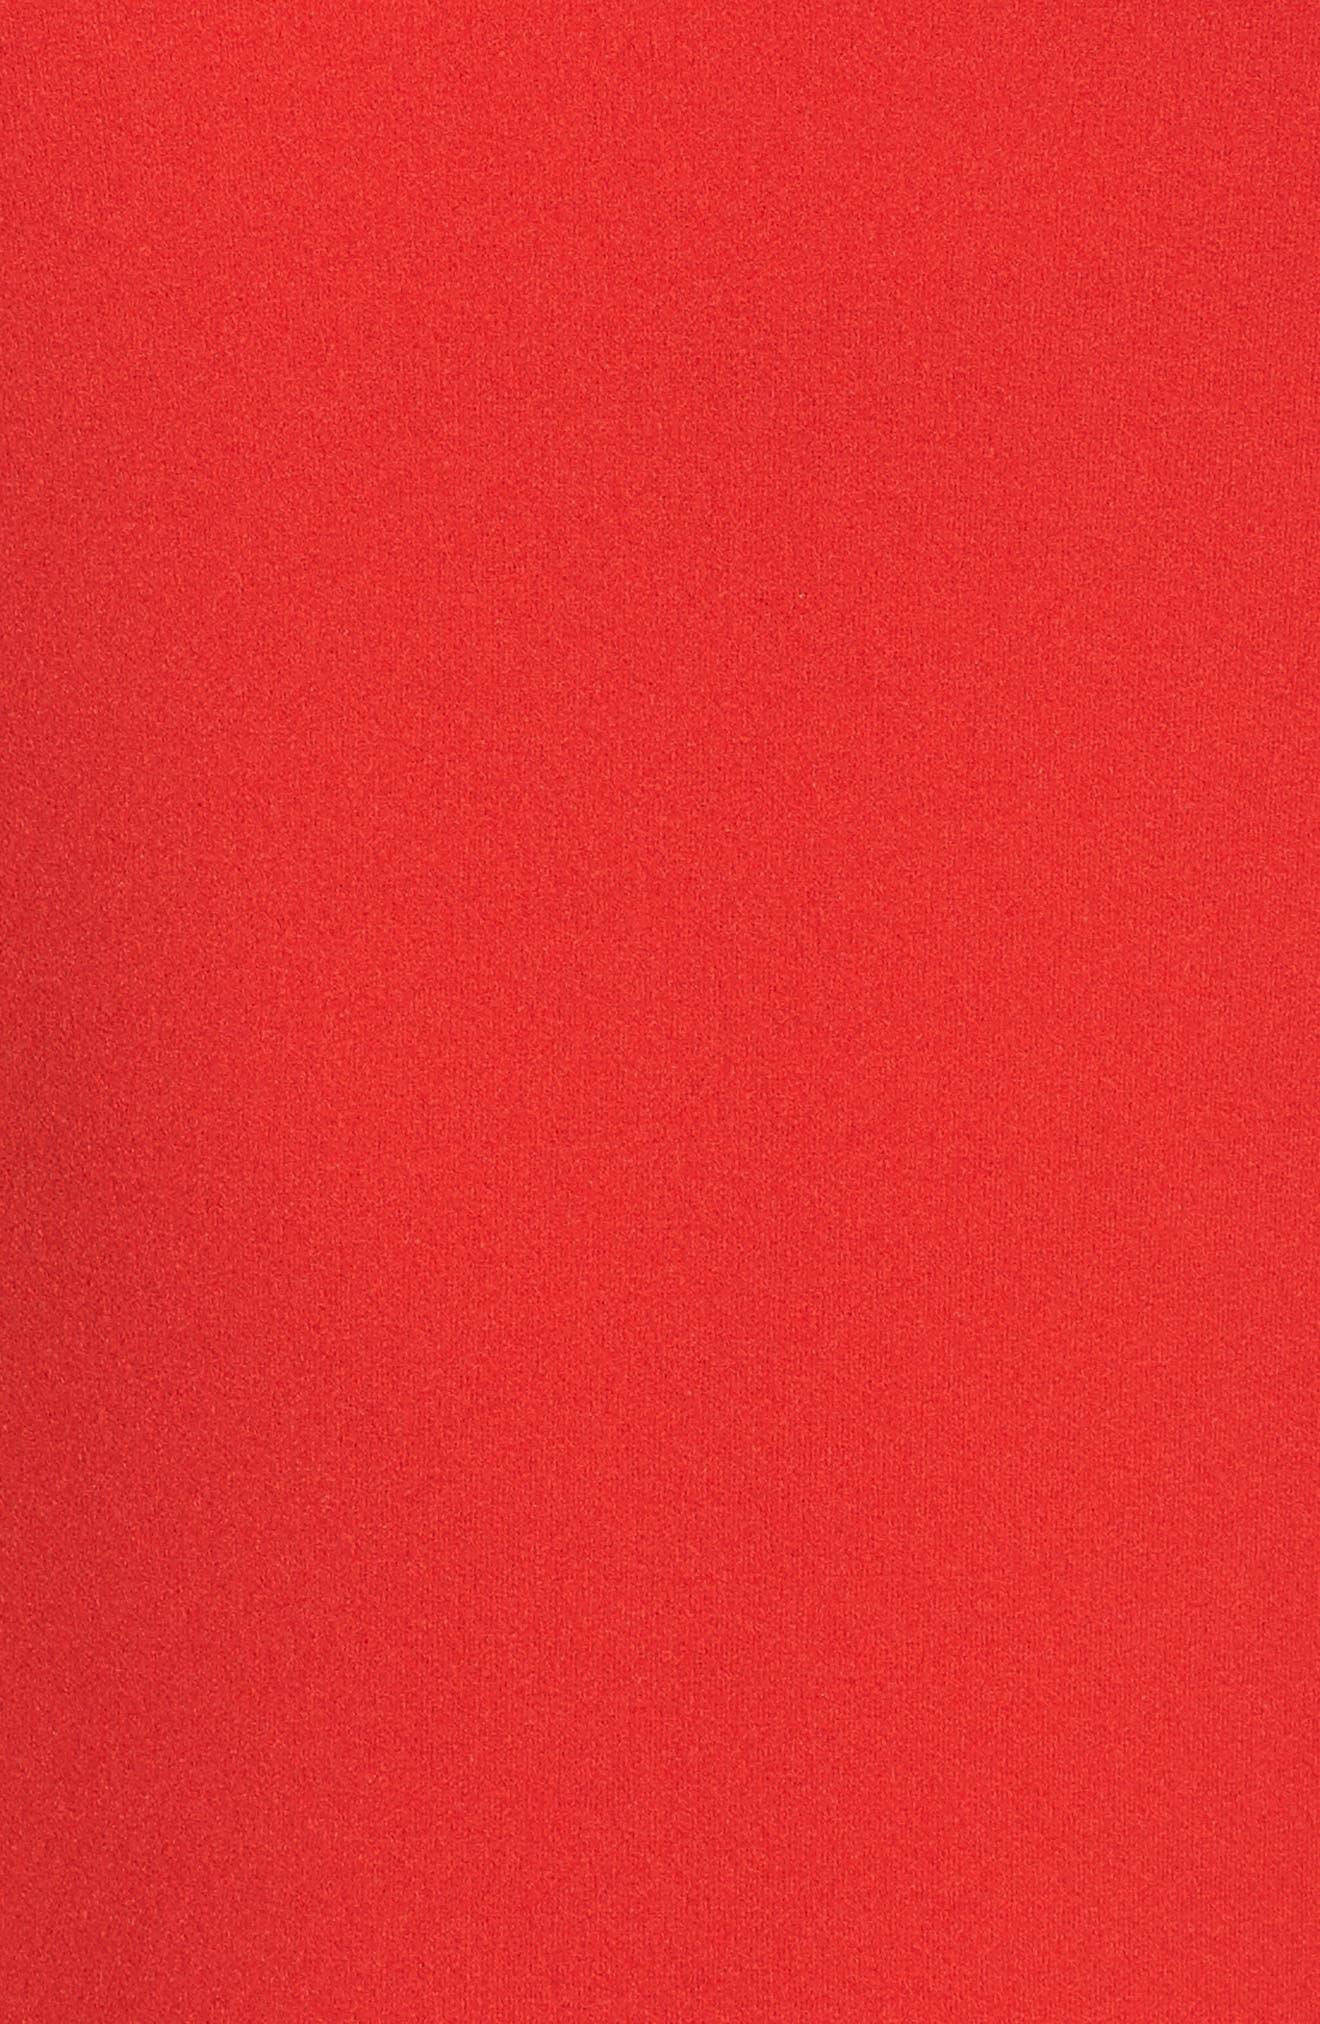 Off the Shoulder Sheath Dress,                             Alternate thumbnail 18, color,